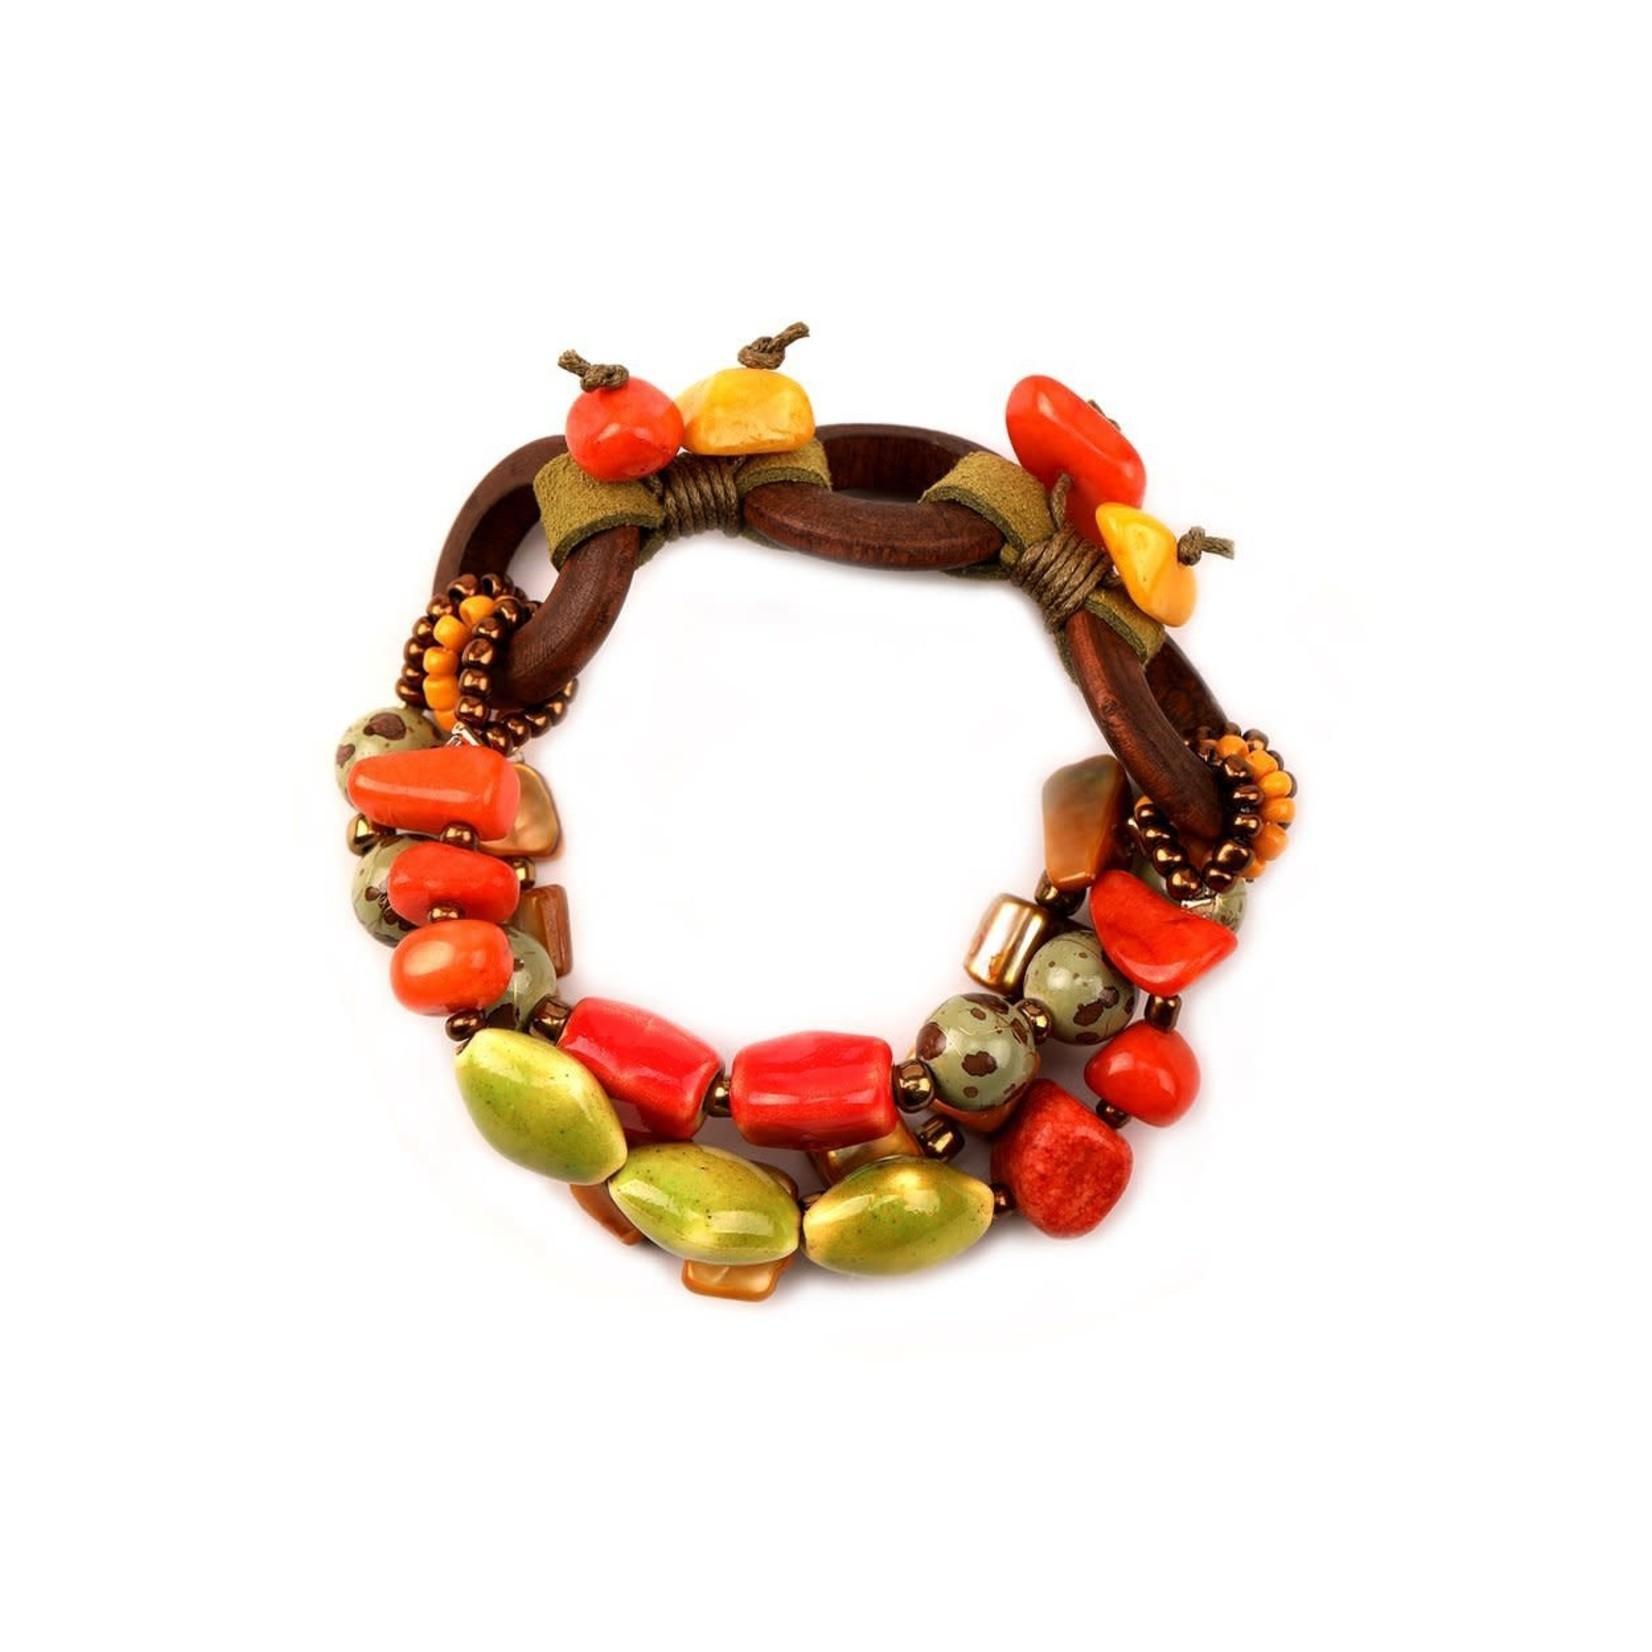 Treska Bali Hai Ceramic/Wood/Shell Bead and Cord Stretch Bracelet